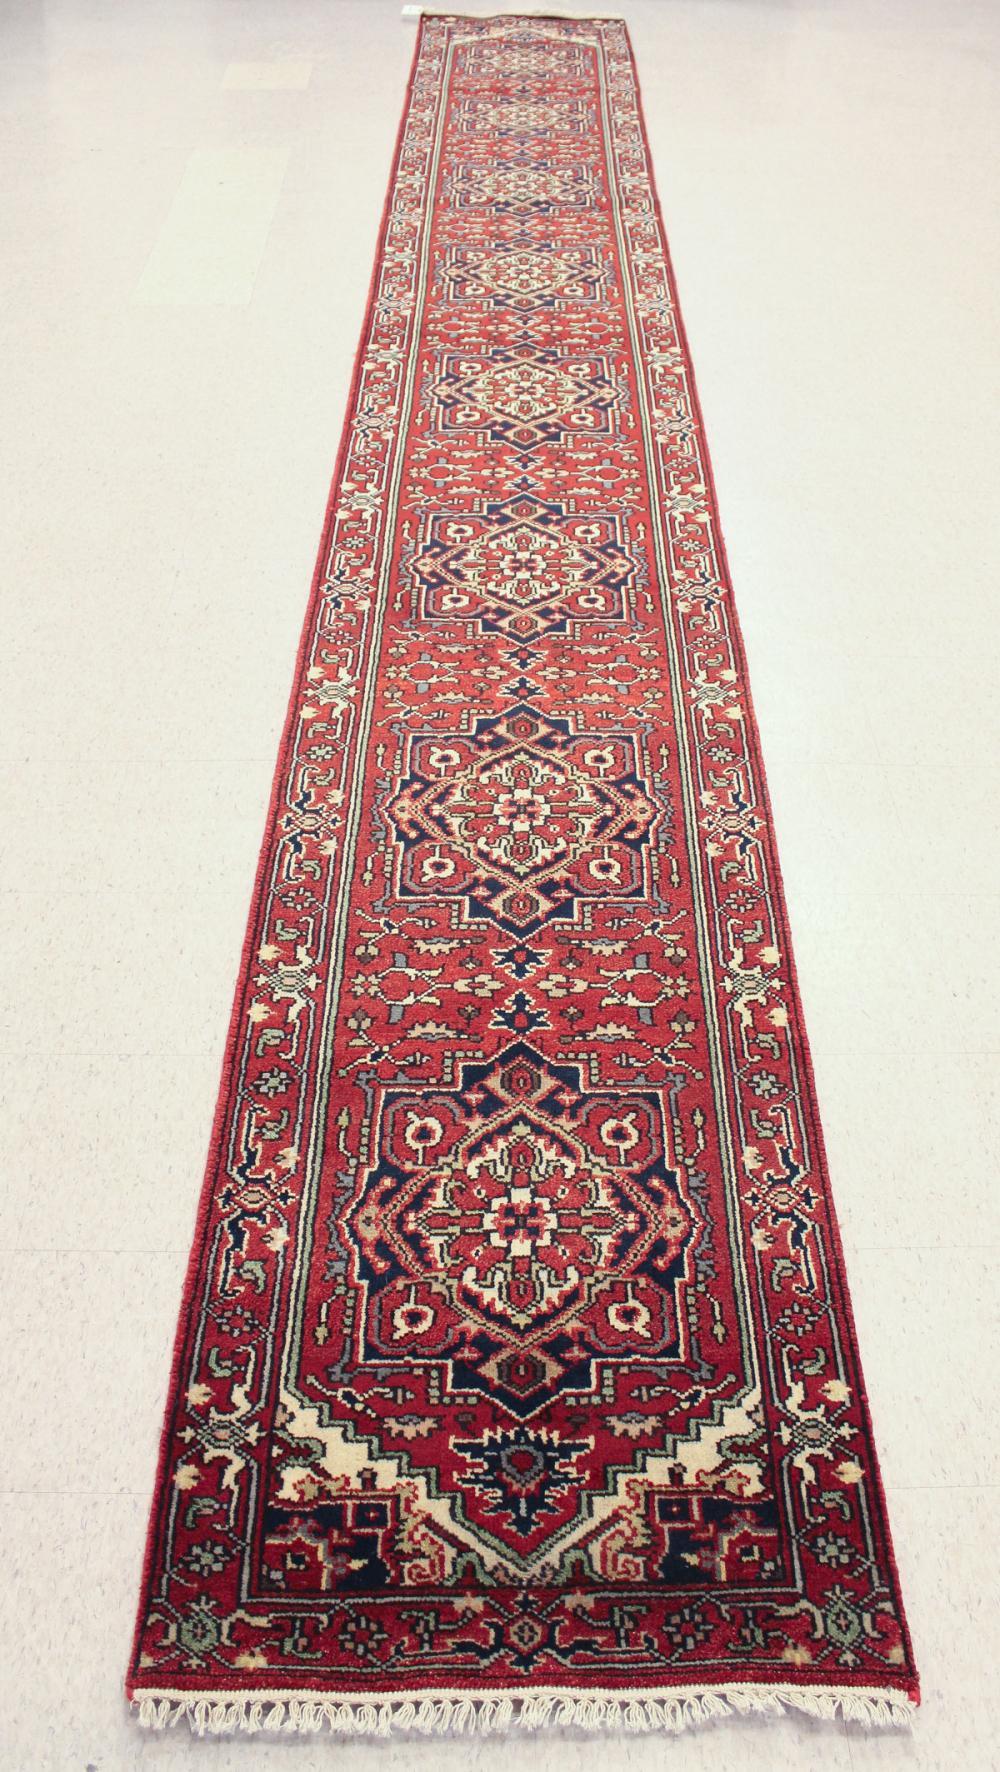 HAND KNOTTED ORIENTAL RUNNER, Persian Serab design